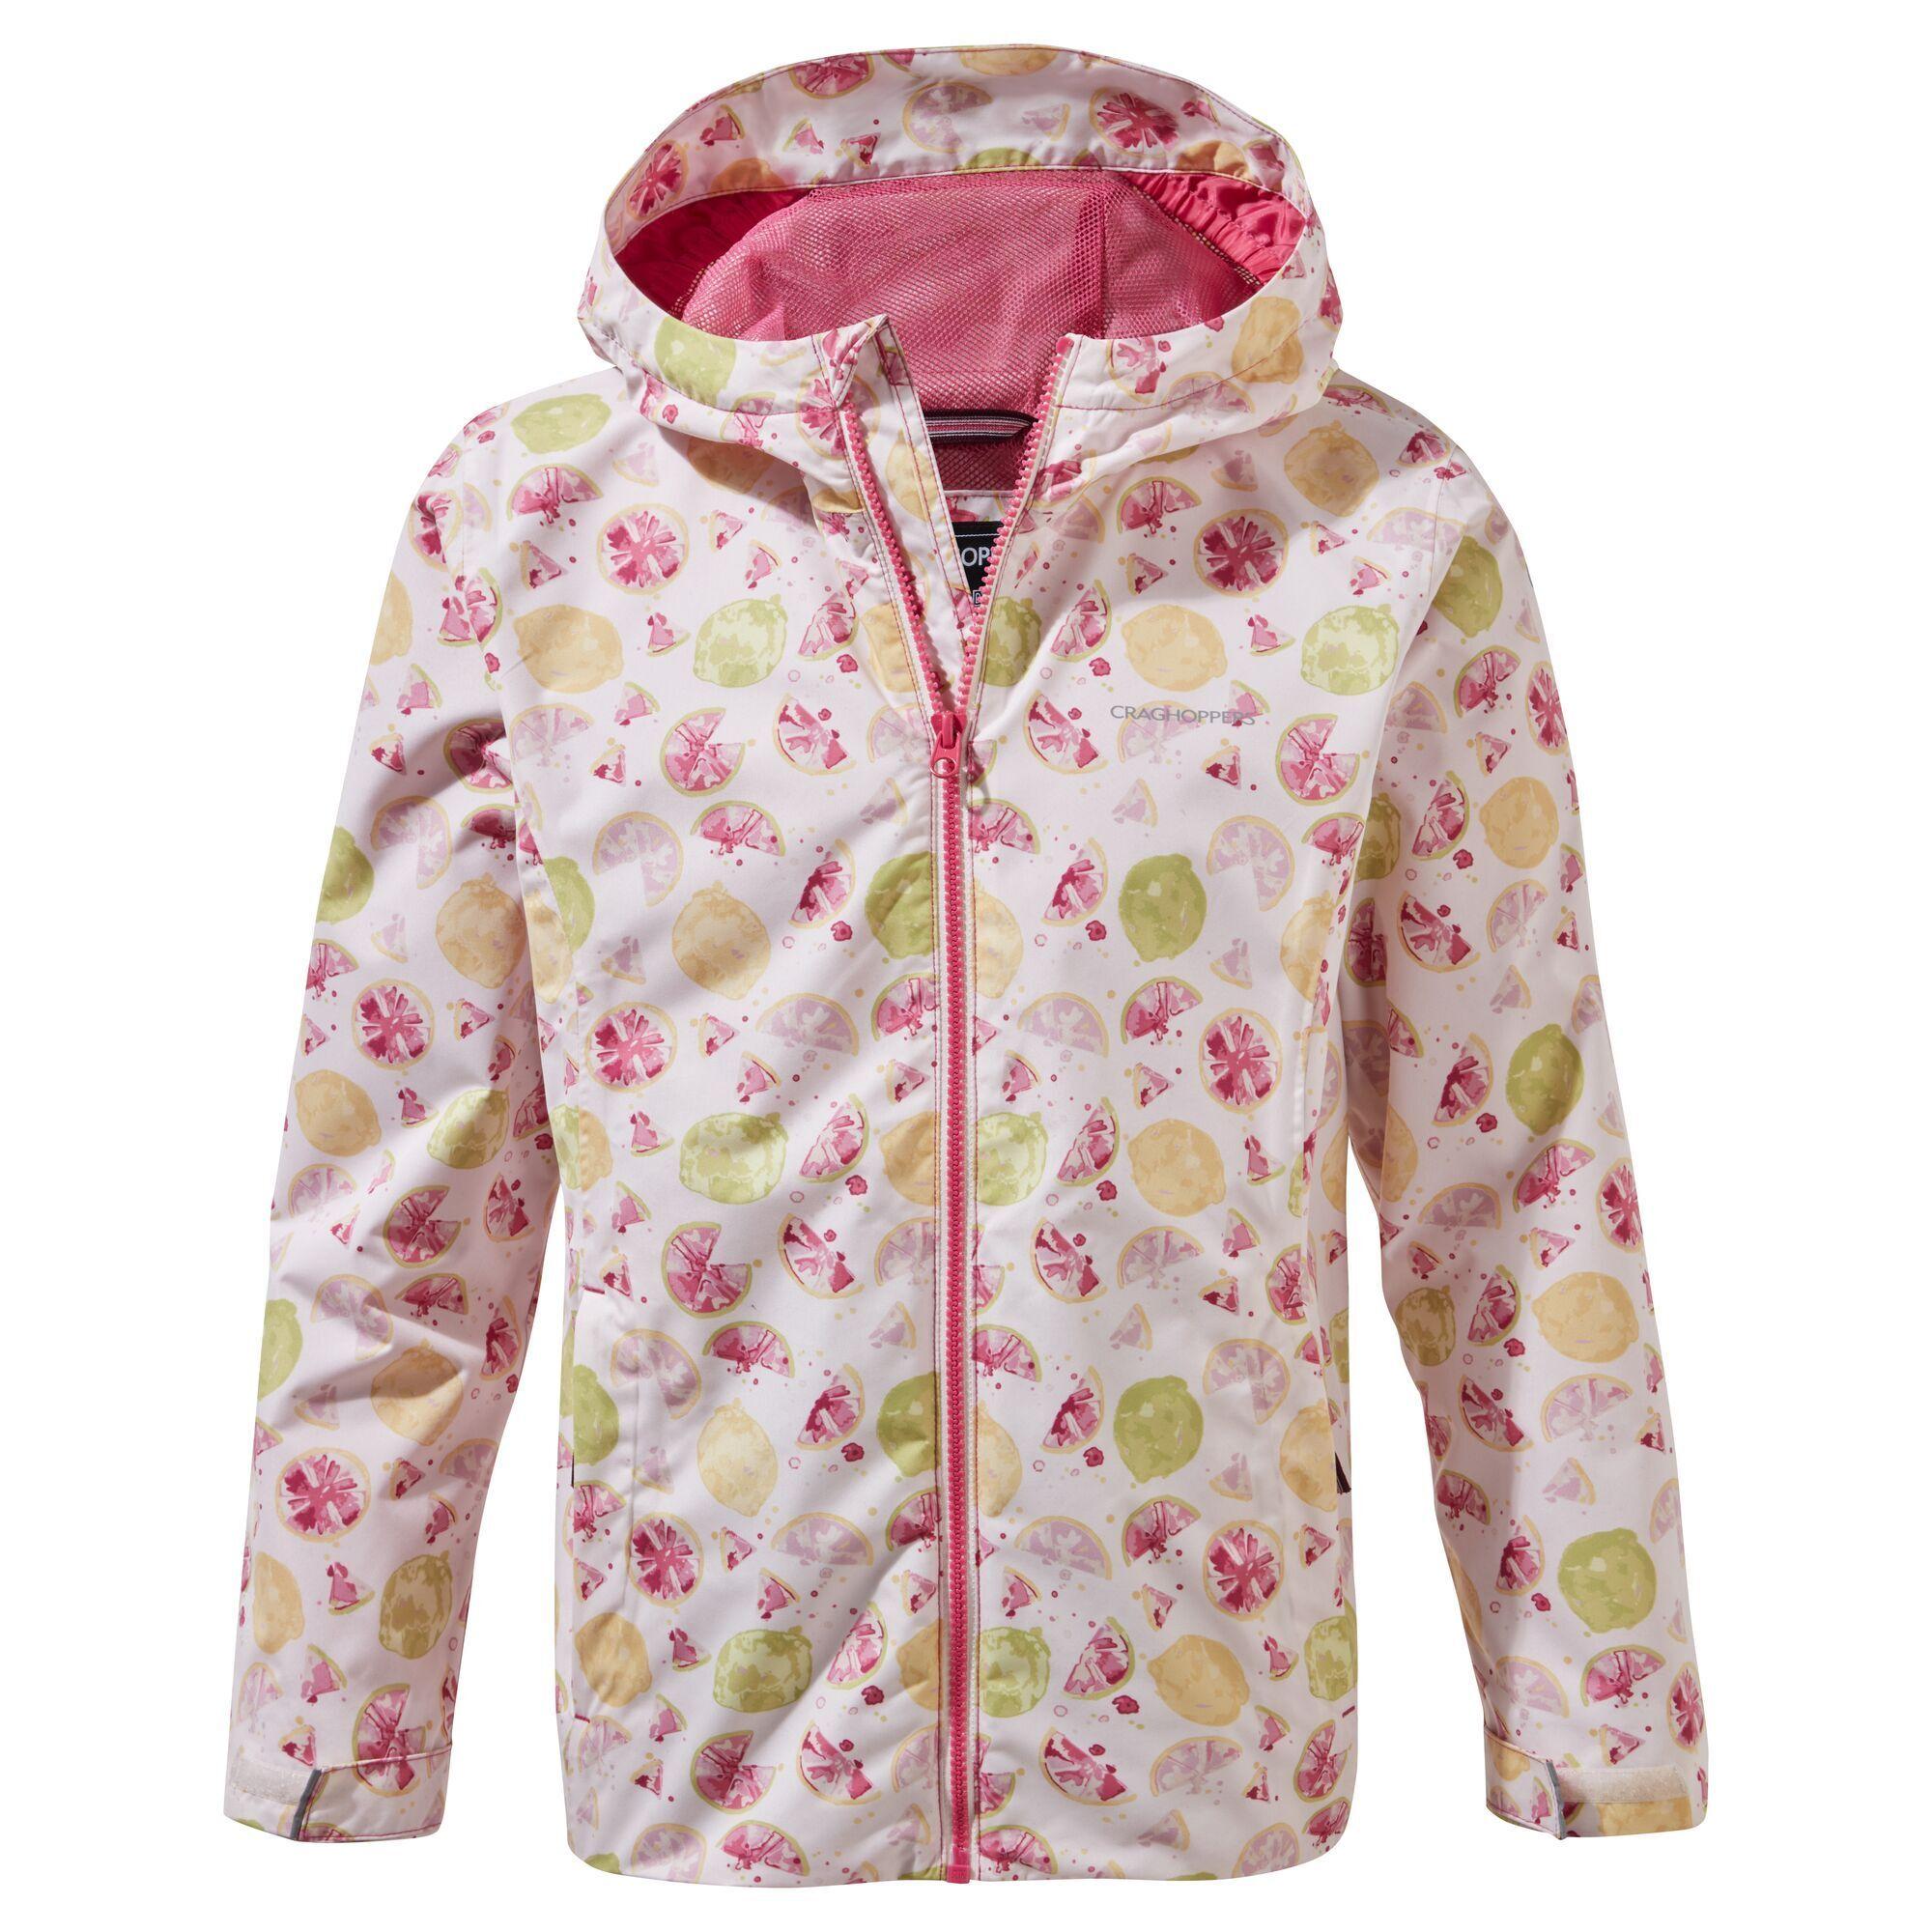 Craghoppers Childrens/Kids Landry Berry Coat (5-6 Years) (Raspberry/White/Lemon Yellow)